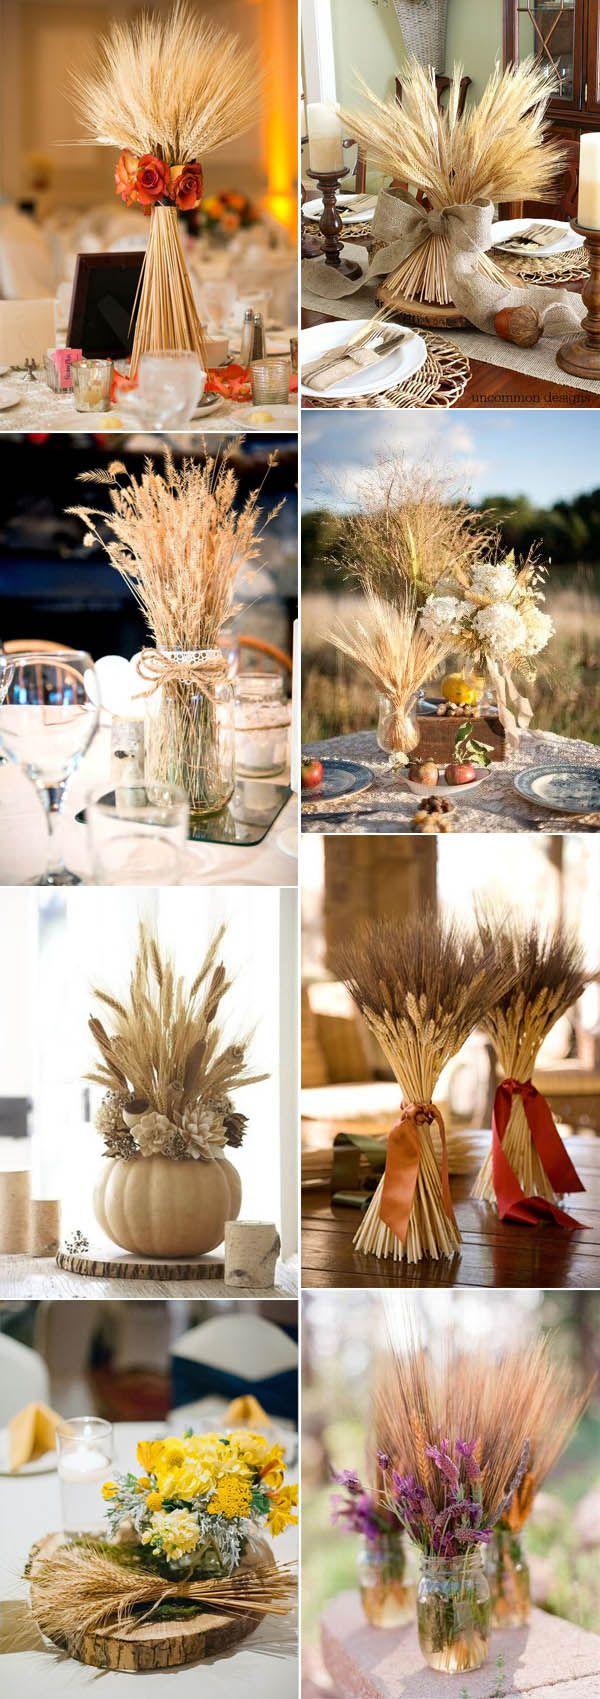 Wedding decorations reception ideas october 2018  Inspirational Fall u Autumn Wedding Centerpieces Ideas in